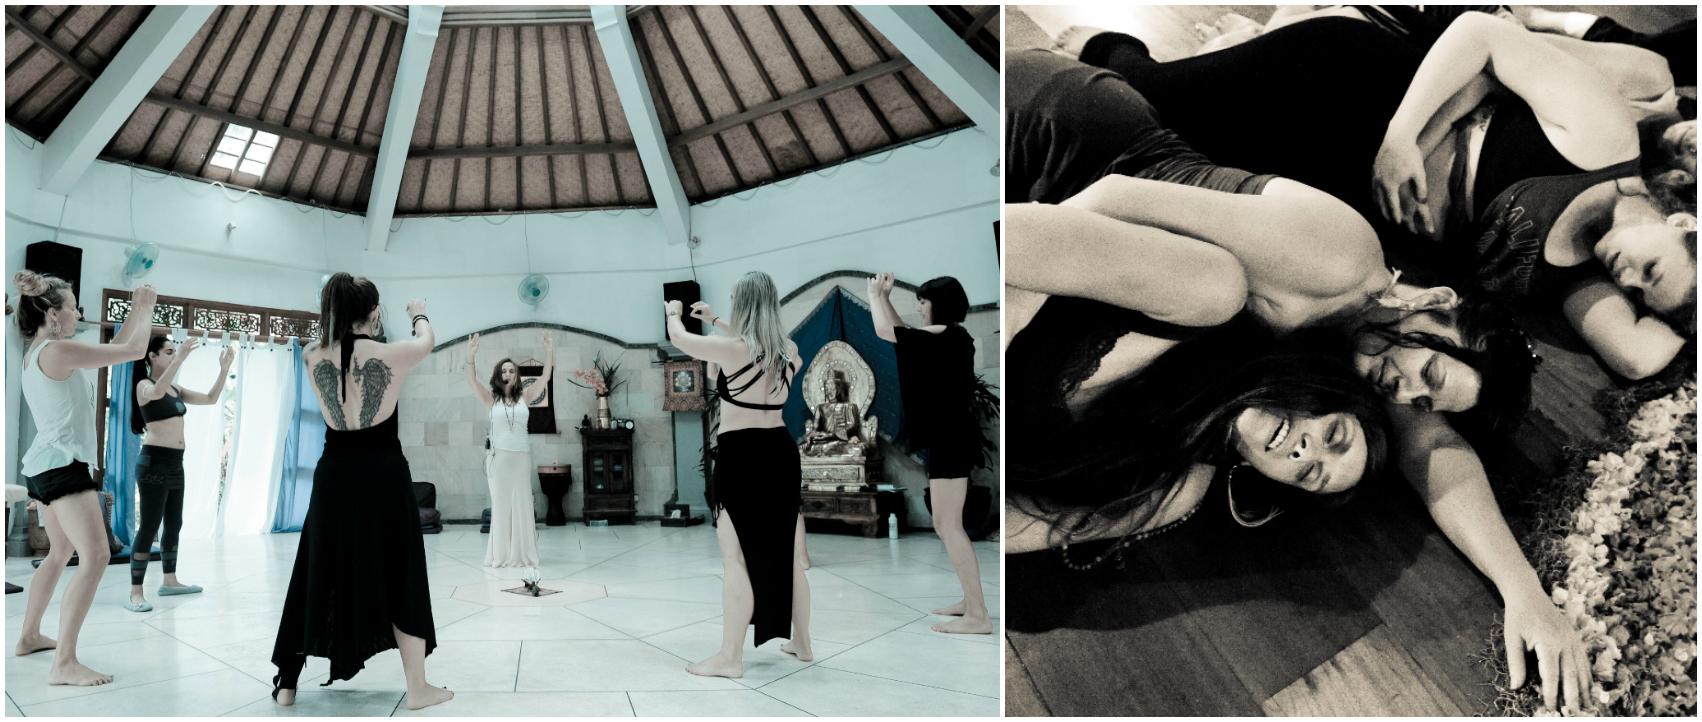 collage-1-kd-training